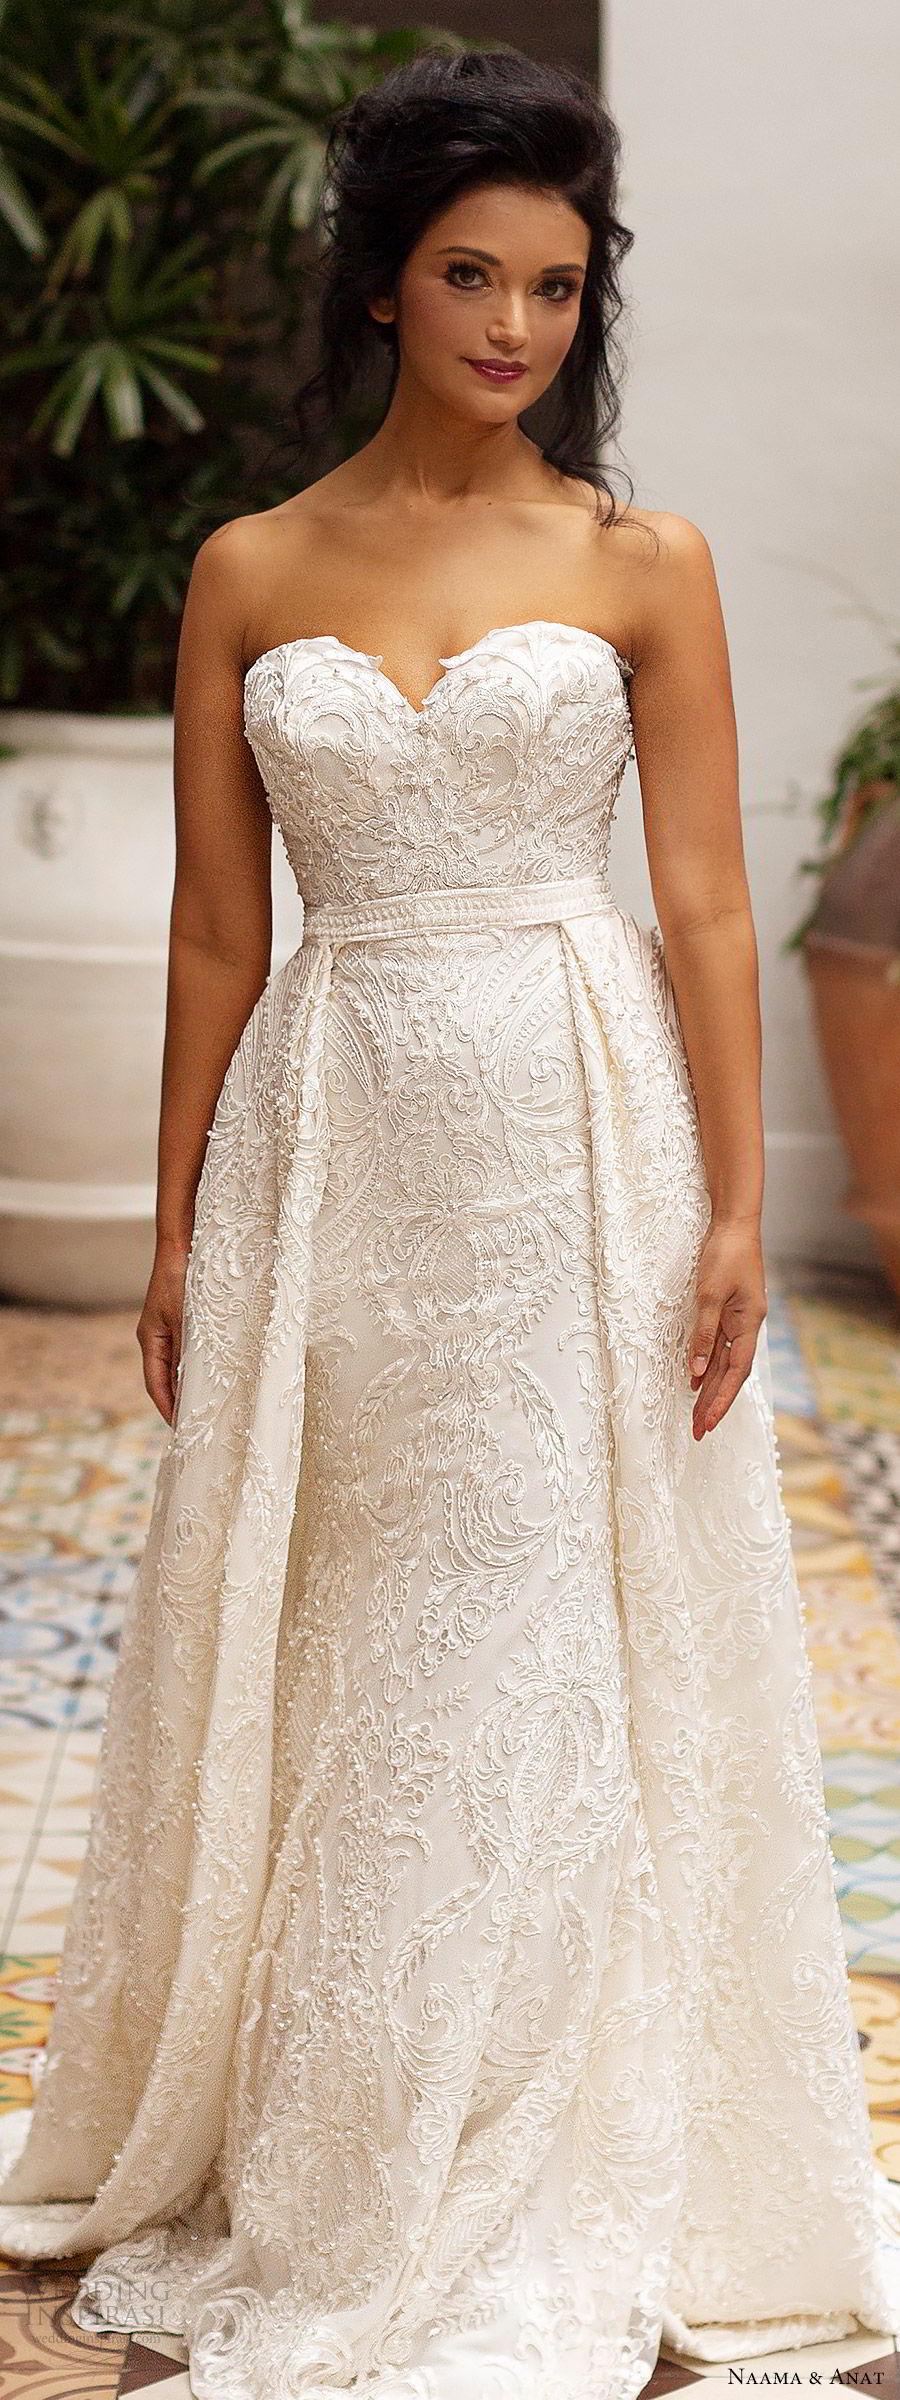 naama anat 2019 bridal strapless sweetheart fully embellished sheath lace wedding dress overskirt chapel train romantic glam (6) zv